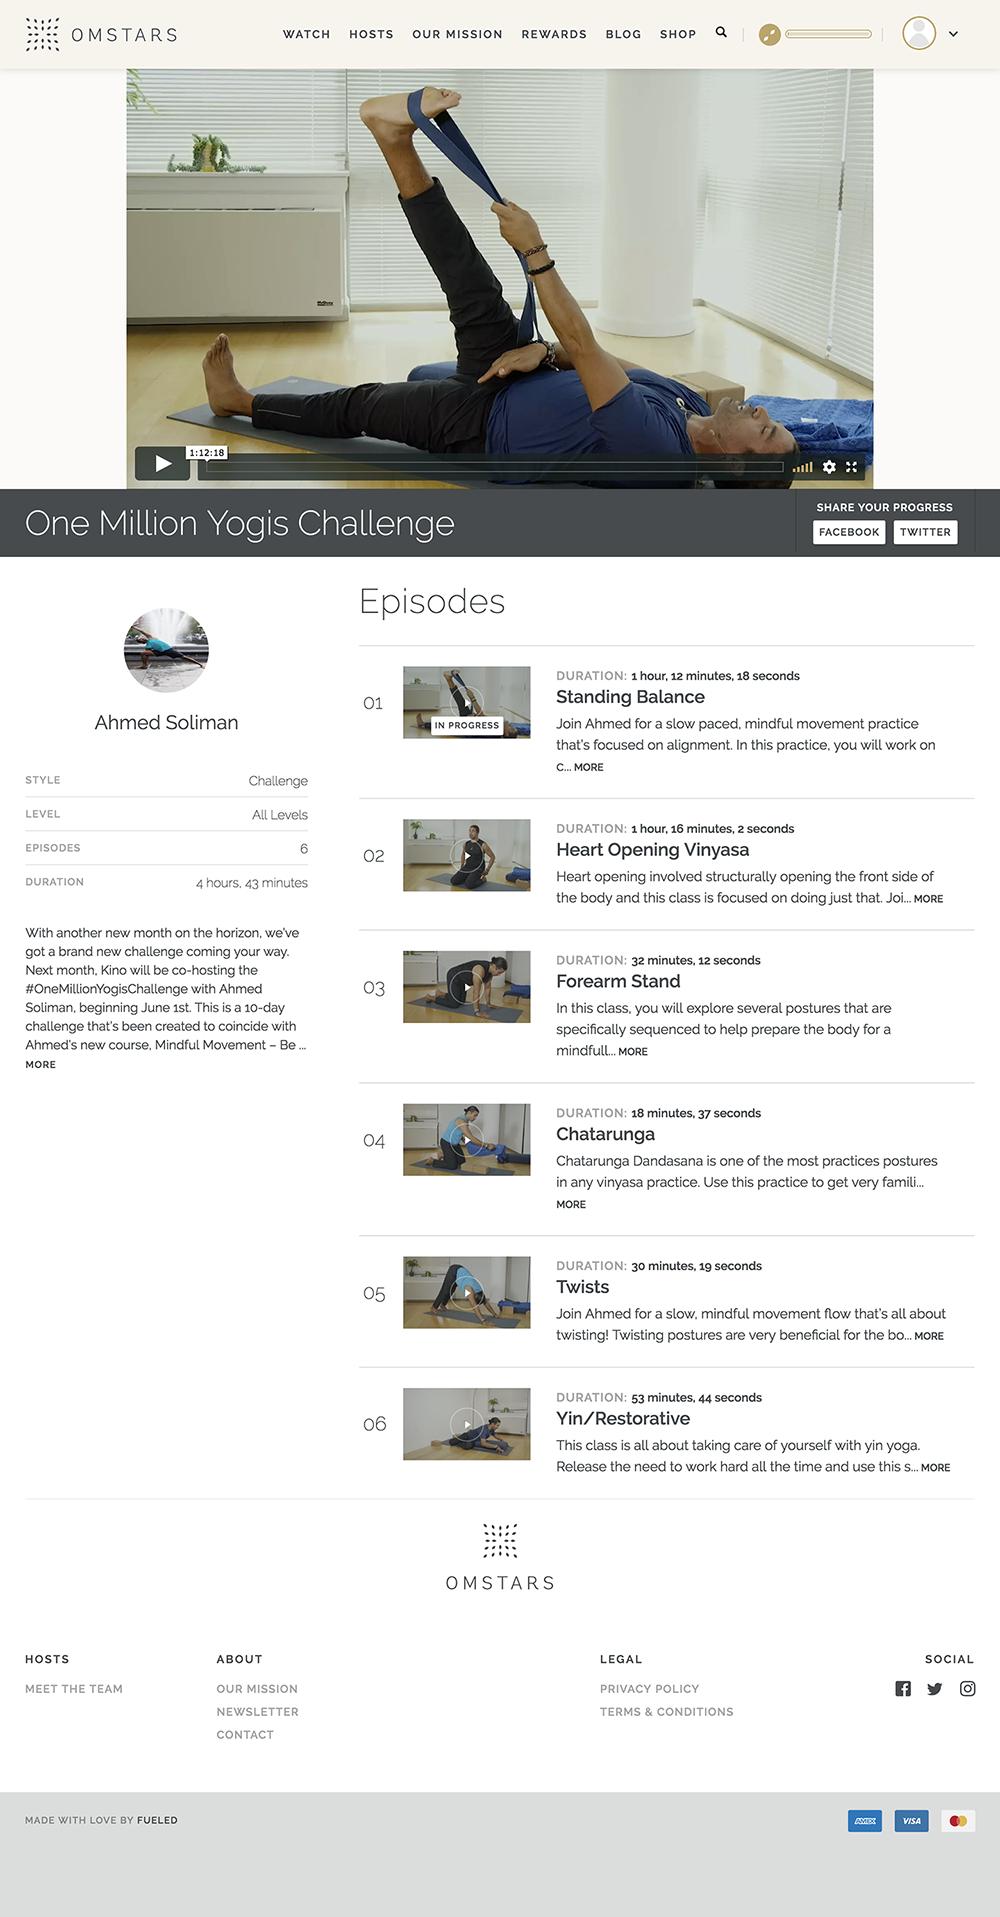 Screenshot of One Million Yogis Challenge